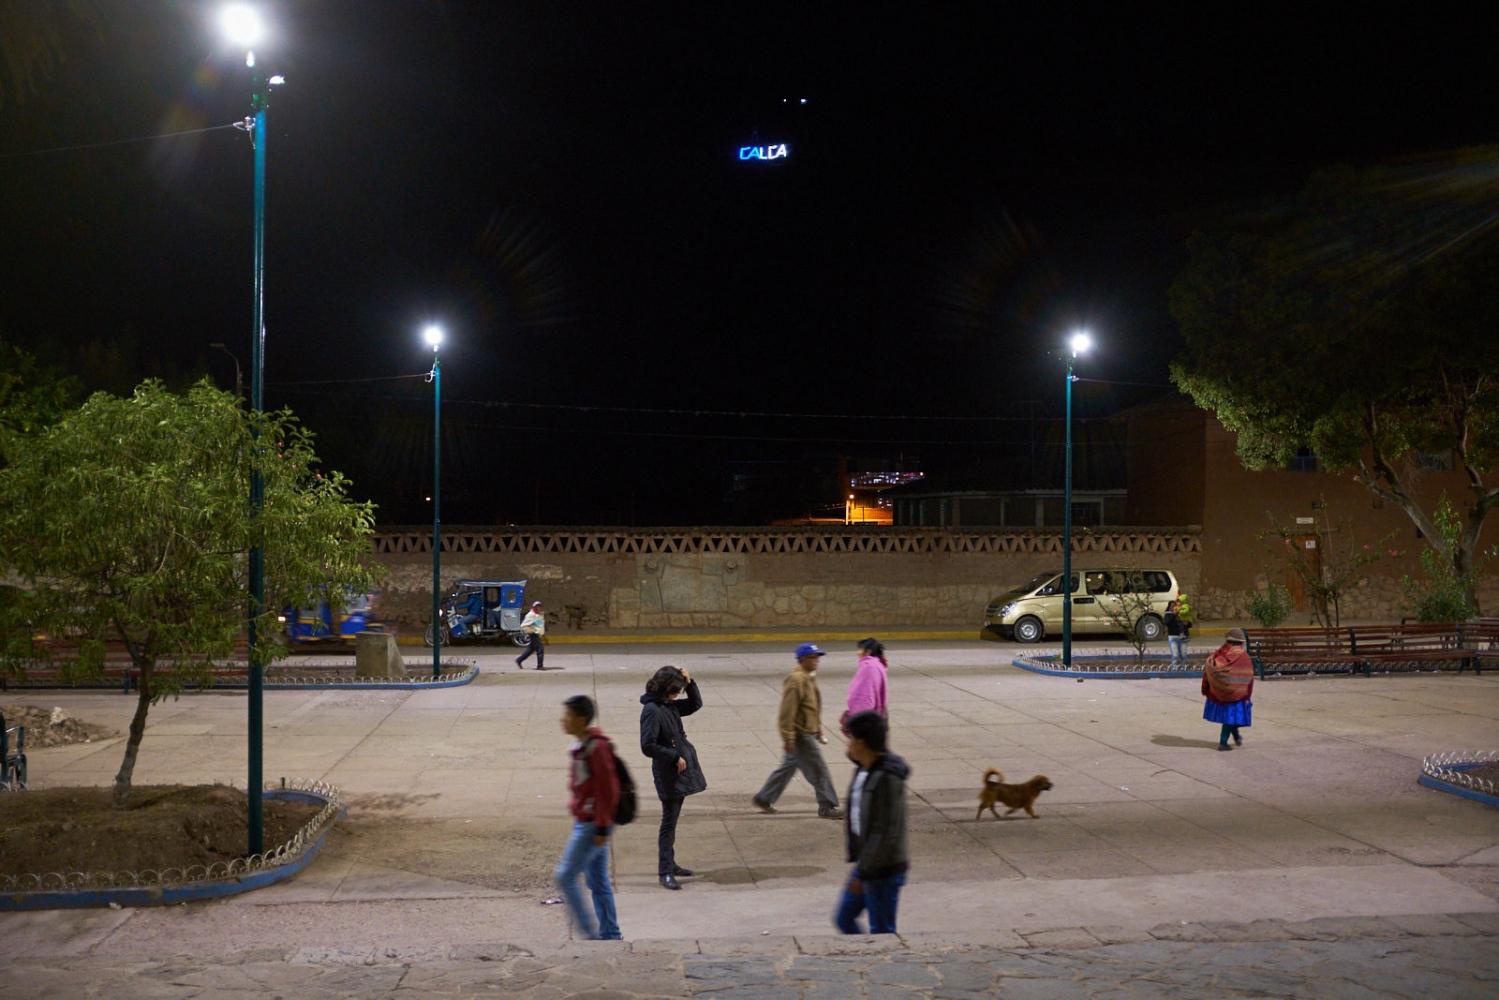 Street scene, Iglesia San Pedro de Calca, Calca, Peru.